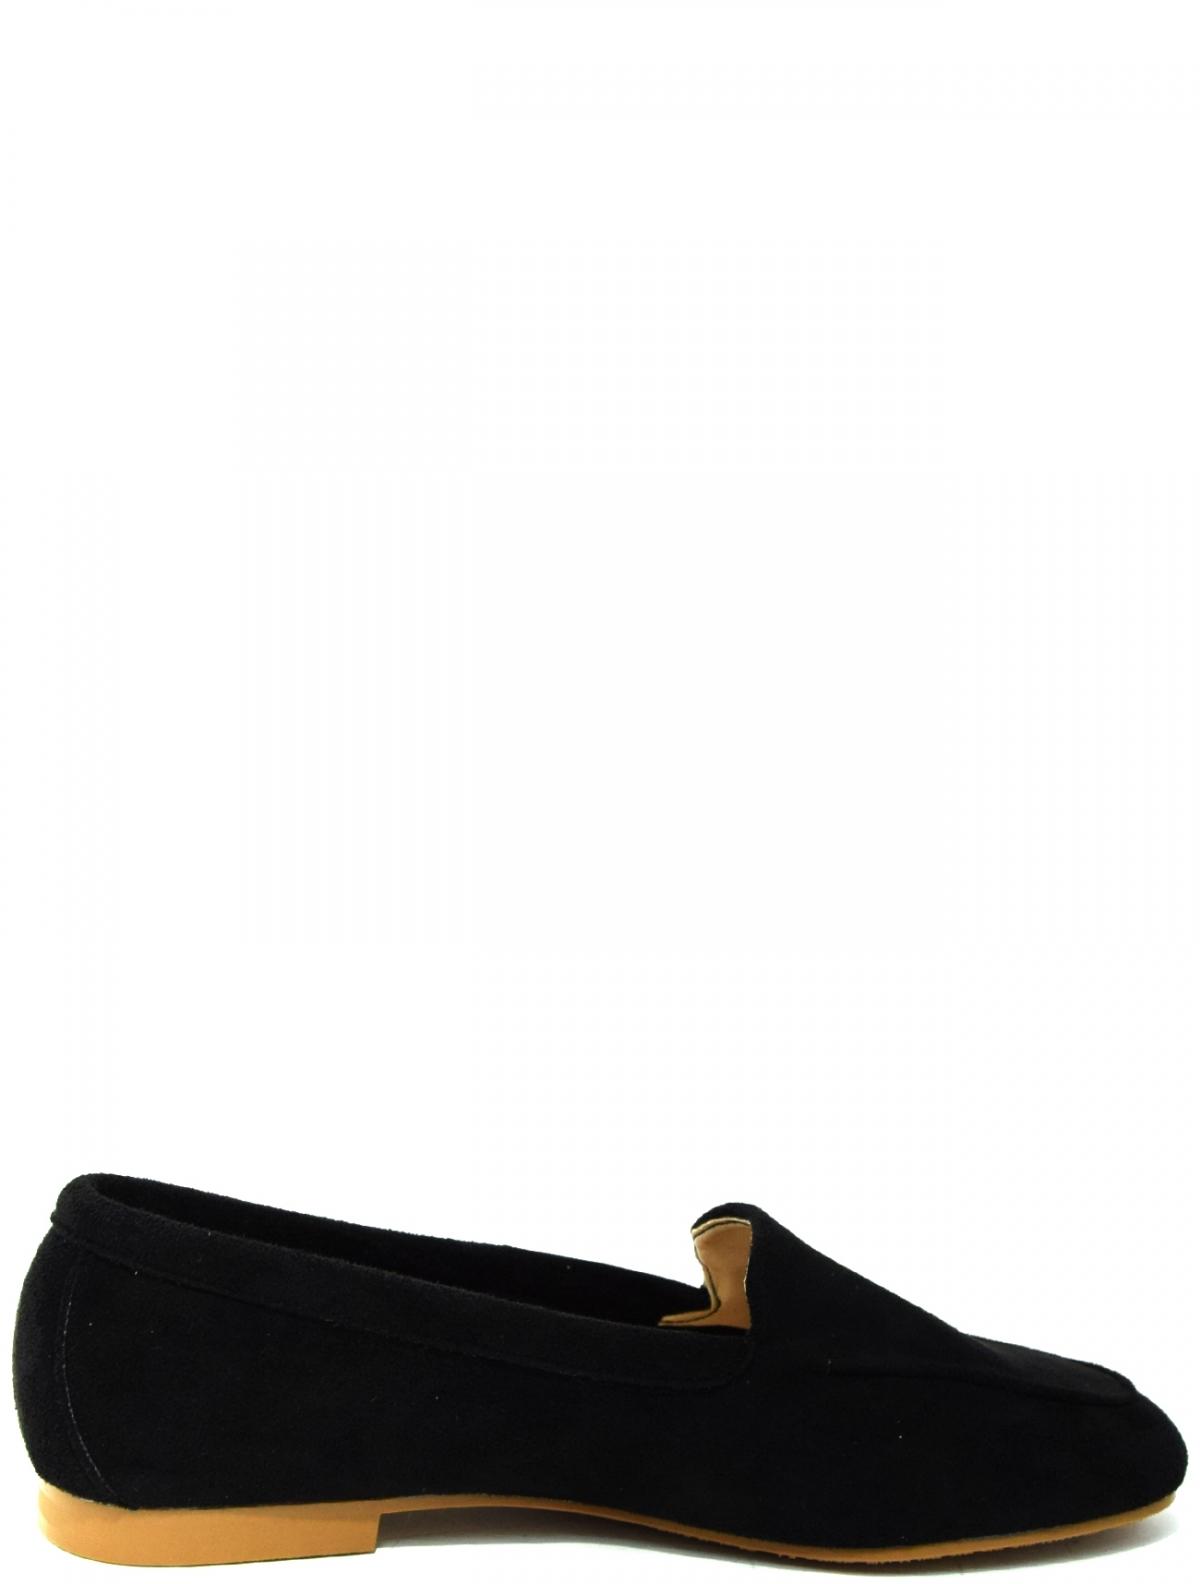 AIDINI TREND 1143-171-712D женские туфли